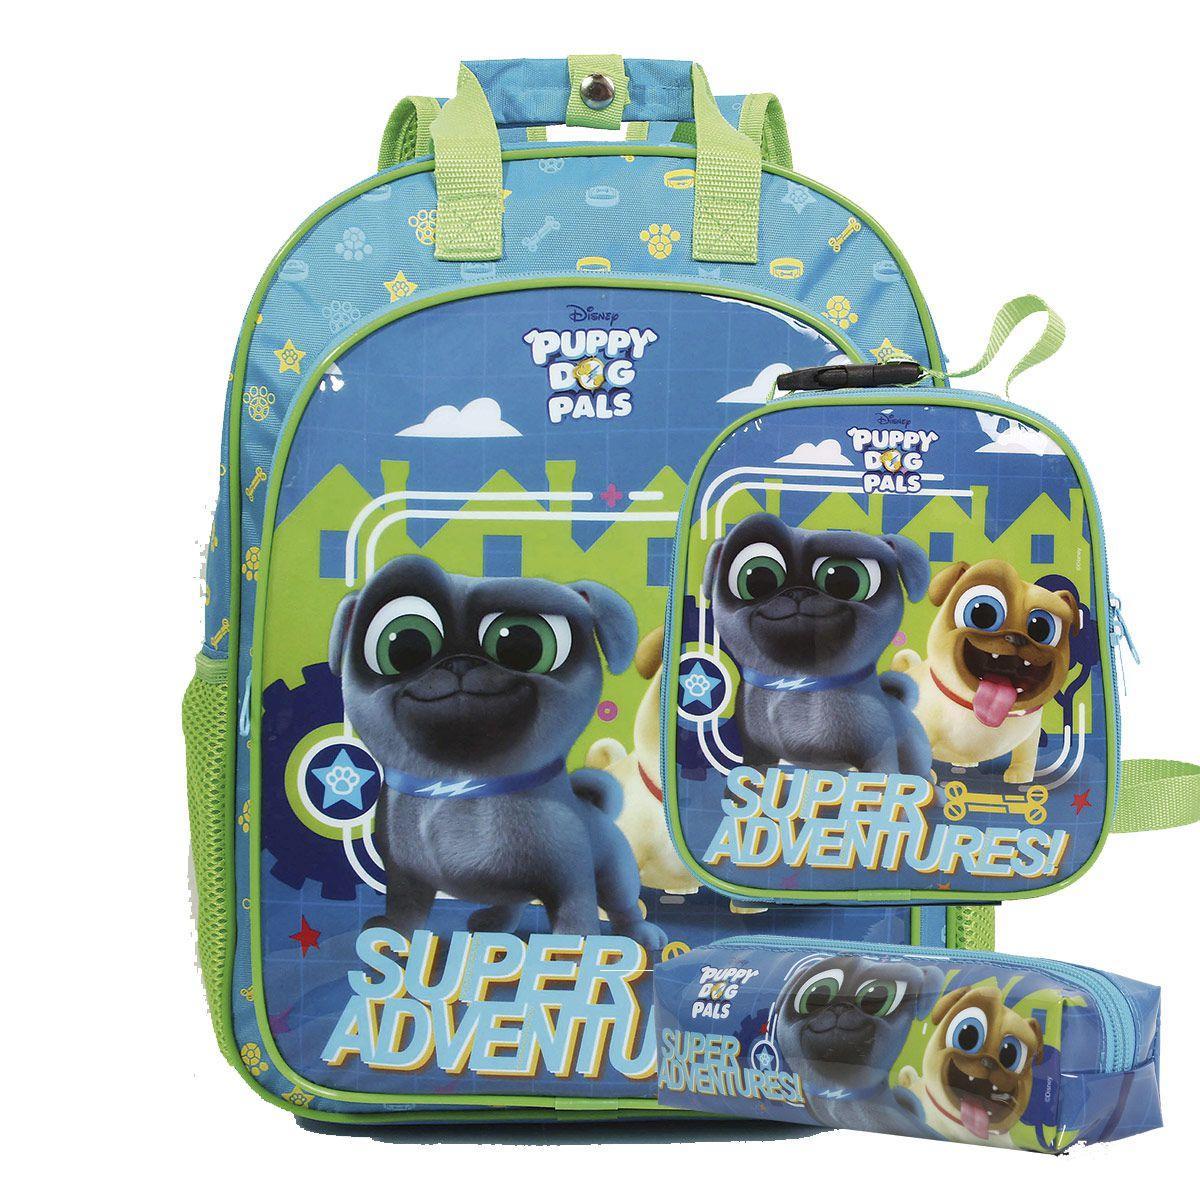 Mochila Puppy Dog Pals Oficial Disney + Lancheira + Estojo